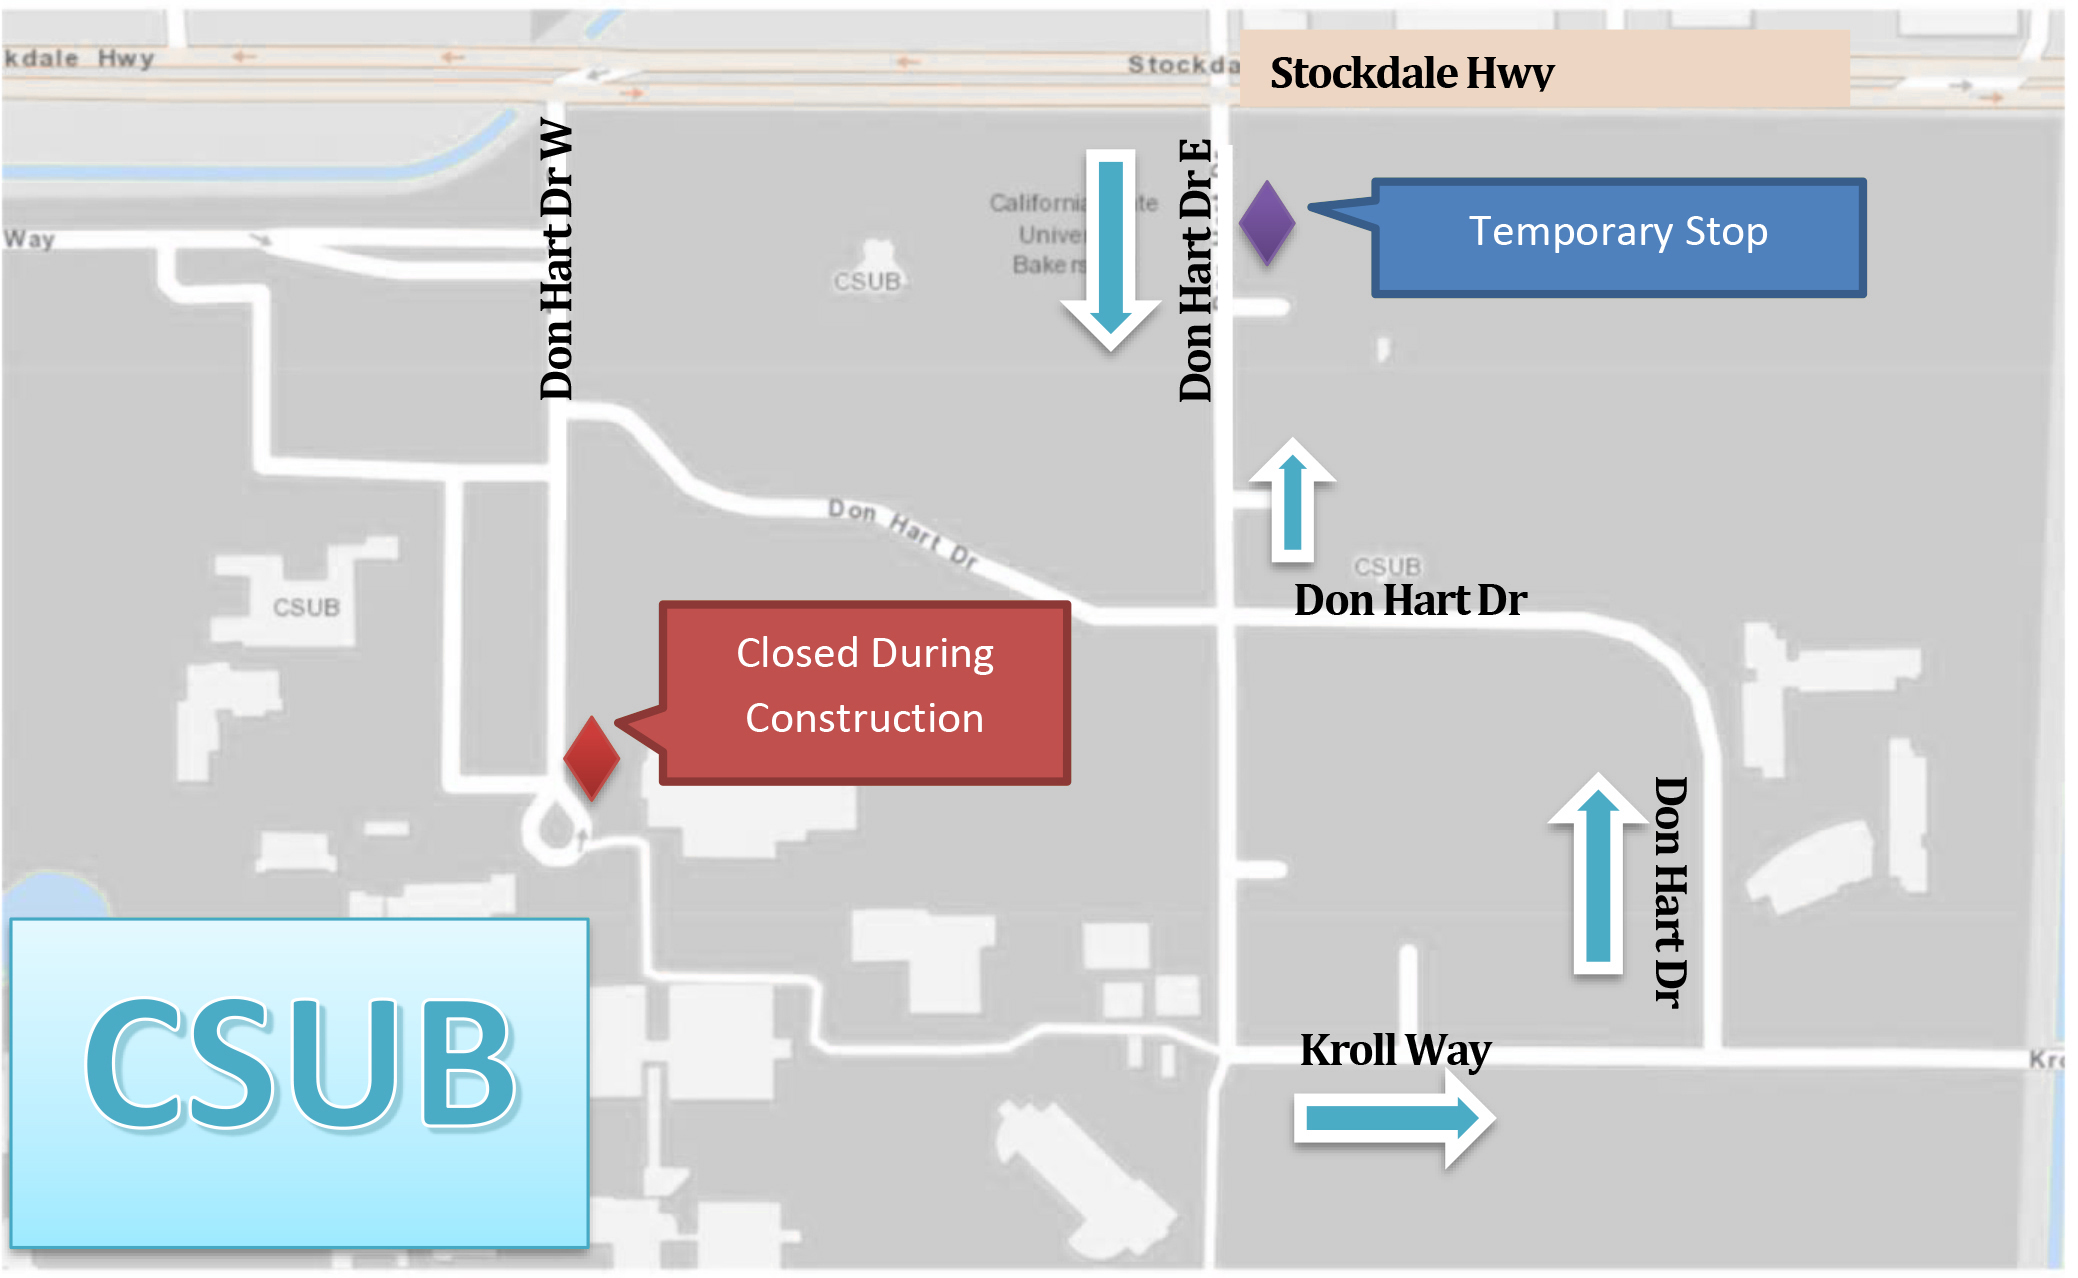 Temporary GET Bus Stop at CSUB